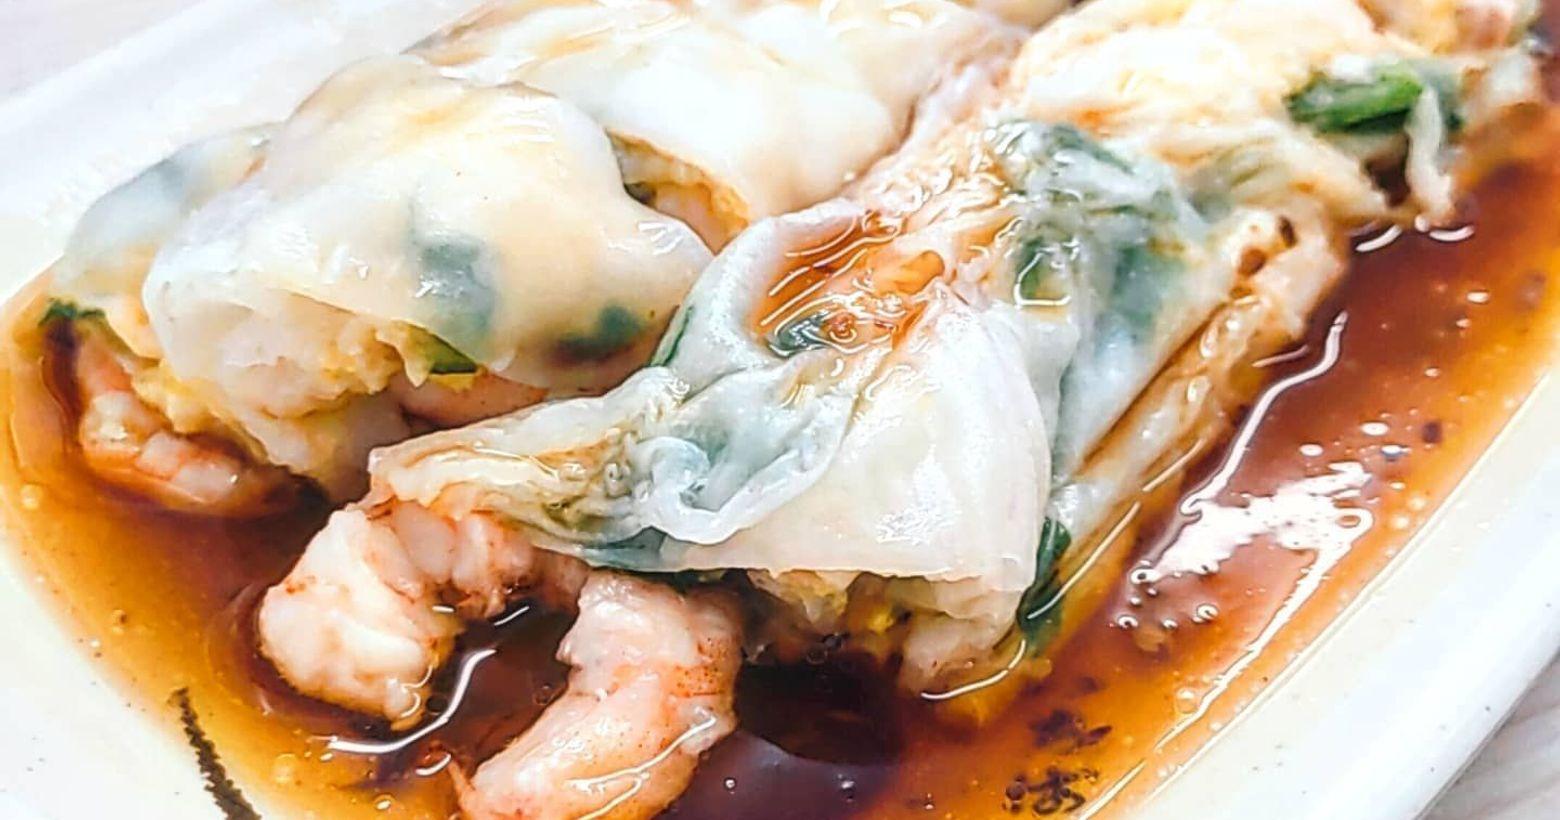 New Taipei #李記正宗廣東腸粉 #永和美食 #廣東腸粉 #樹懶吃新北 這家廣東腸粉位於捷運